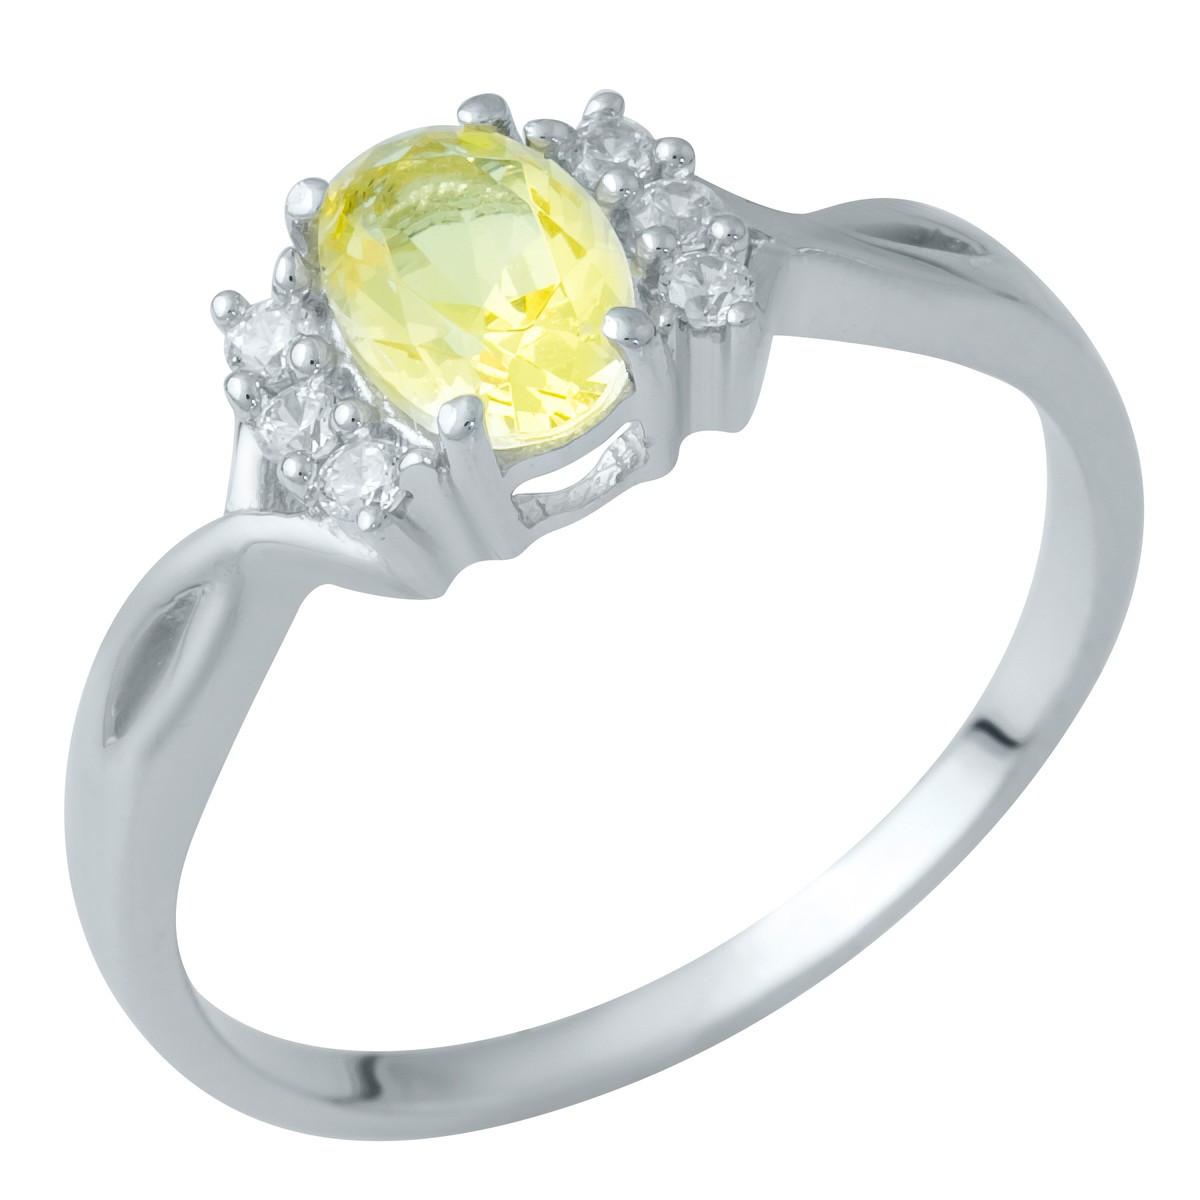 Серебряное кольцо DreamJewelry с цитрином nano (1936108) 18.5 размер